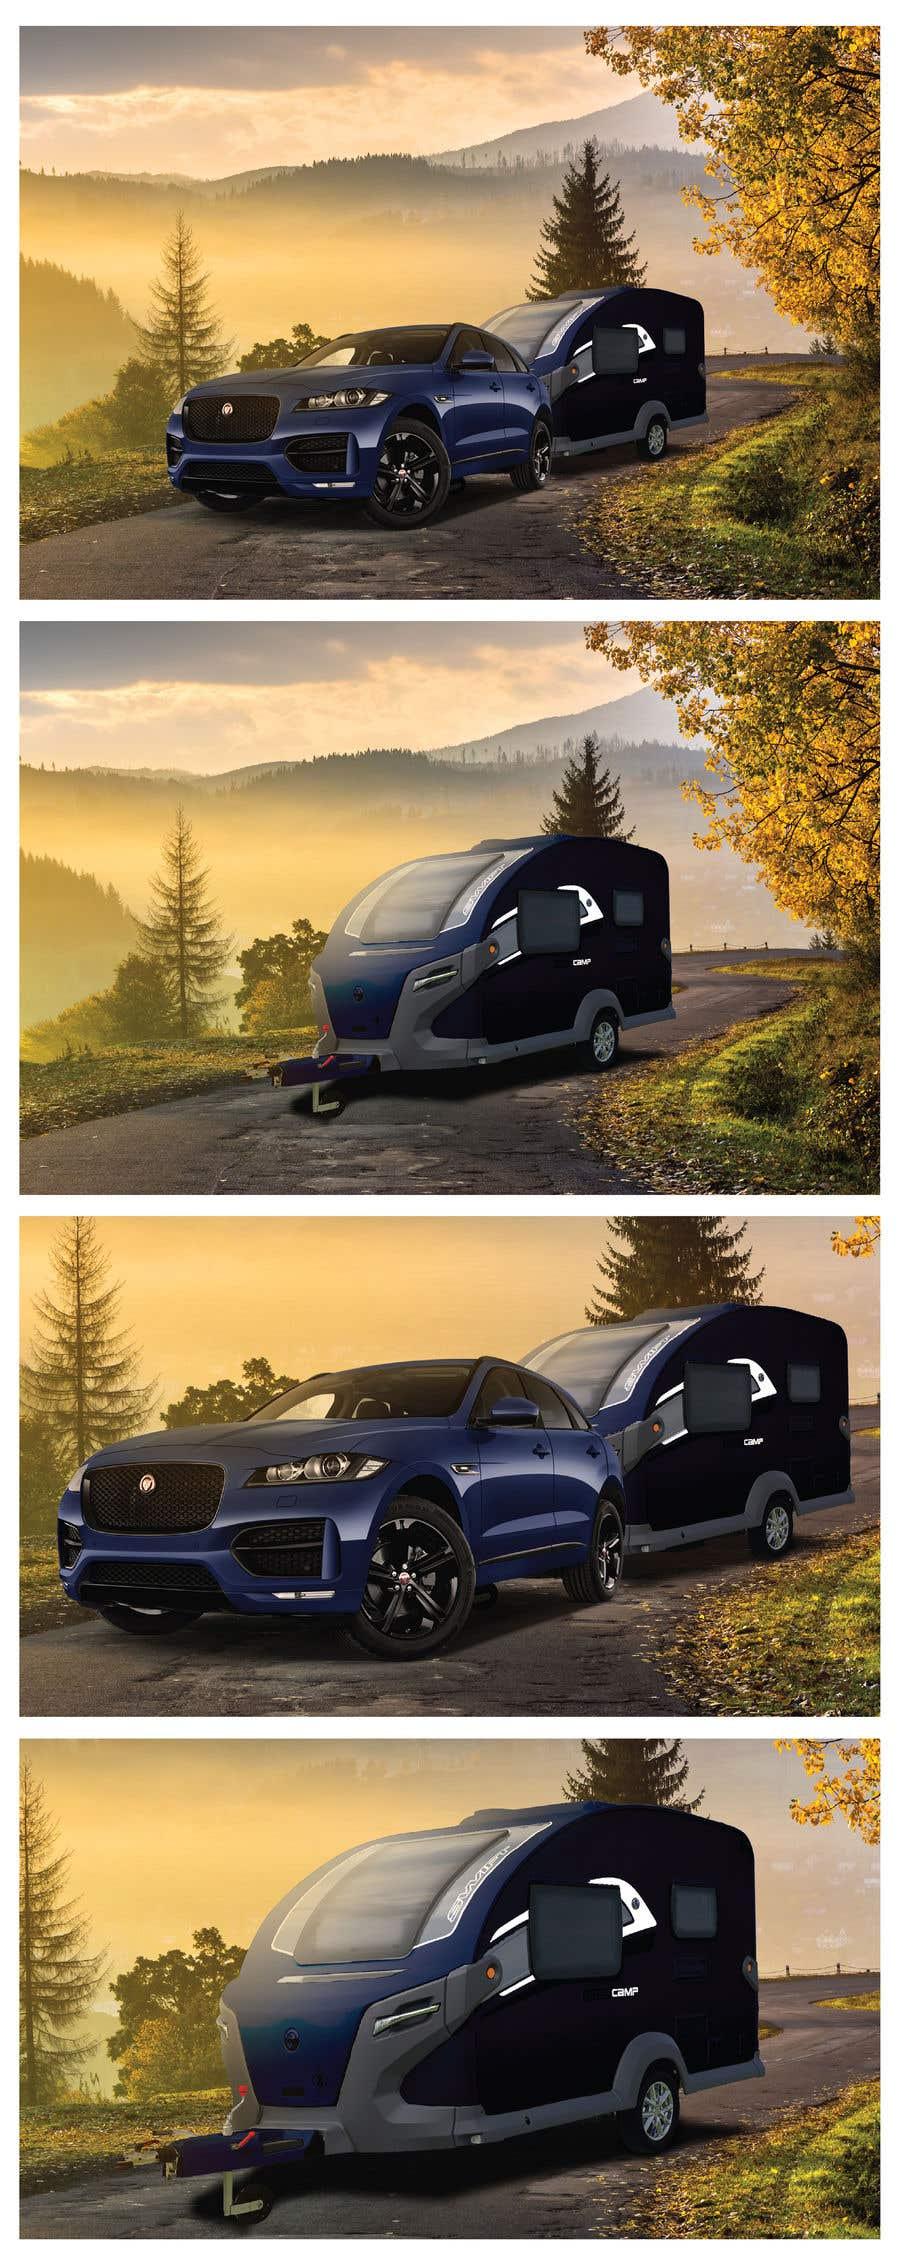 Penyertaan Peraduan #238 untuk Photoshop carvan on background image and change colour